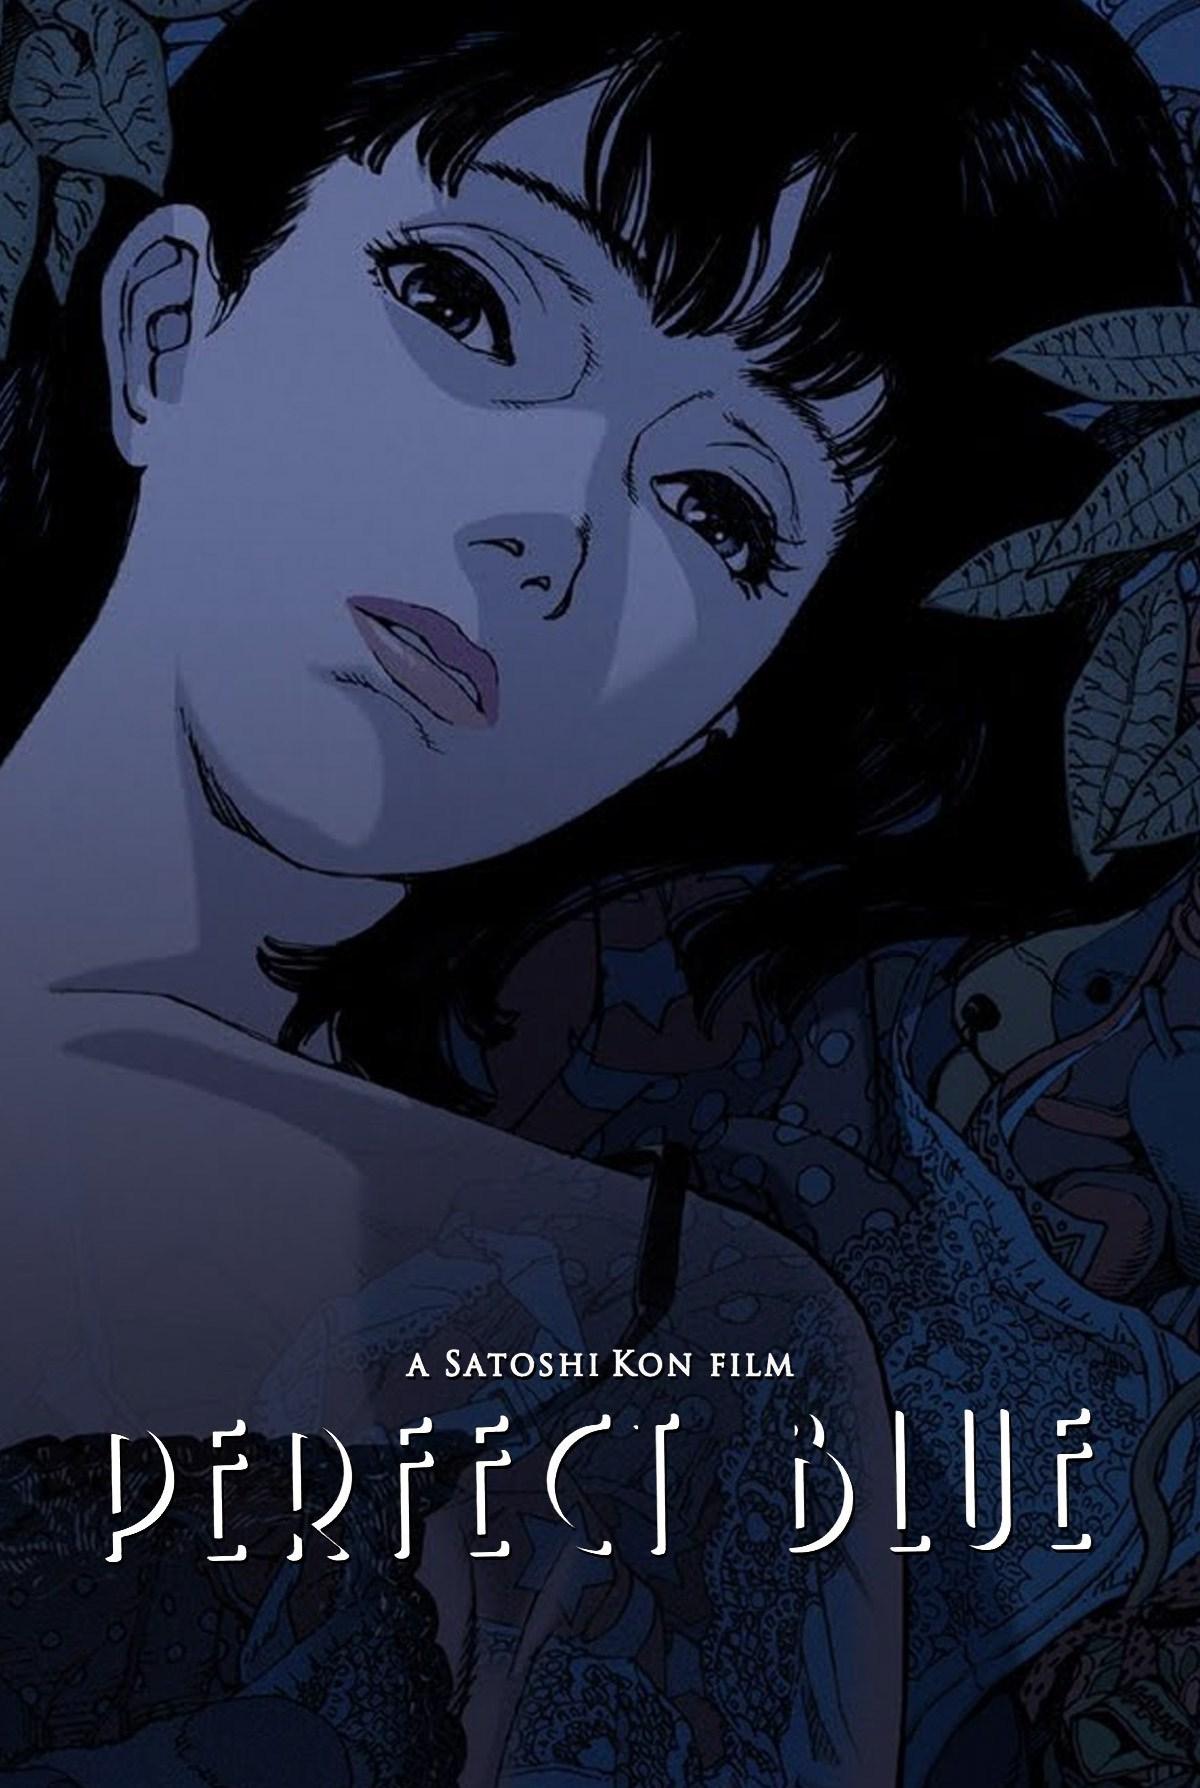 anime sorozat pornóval